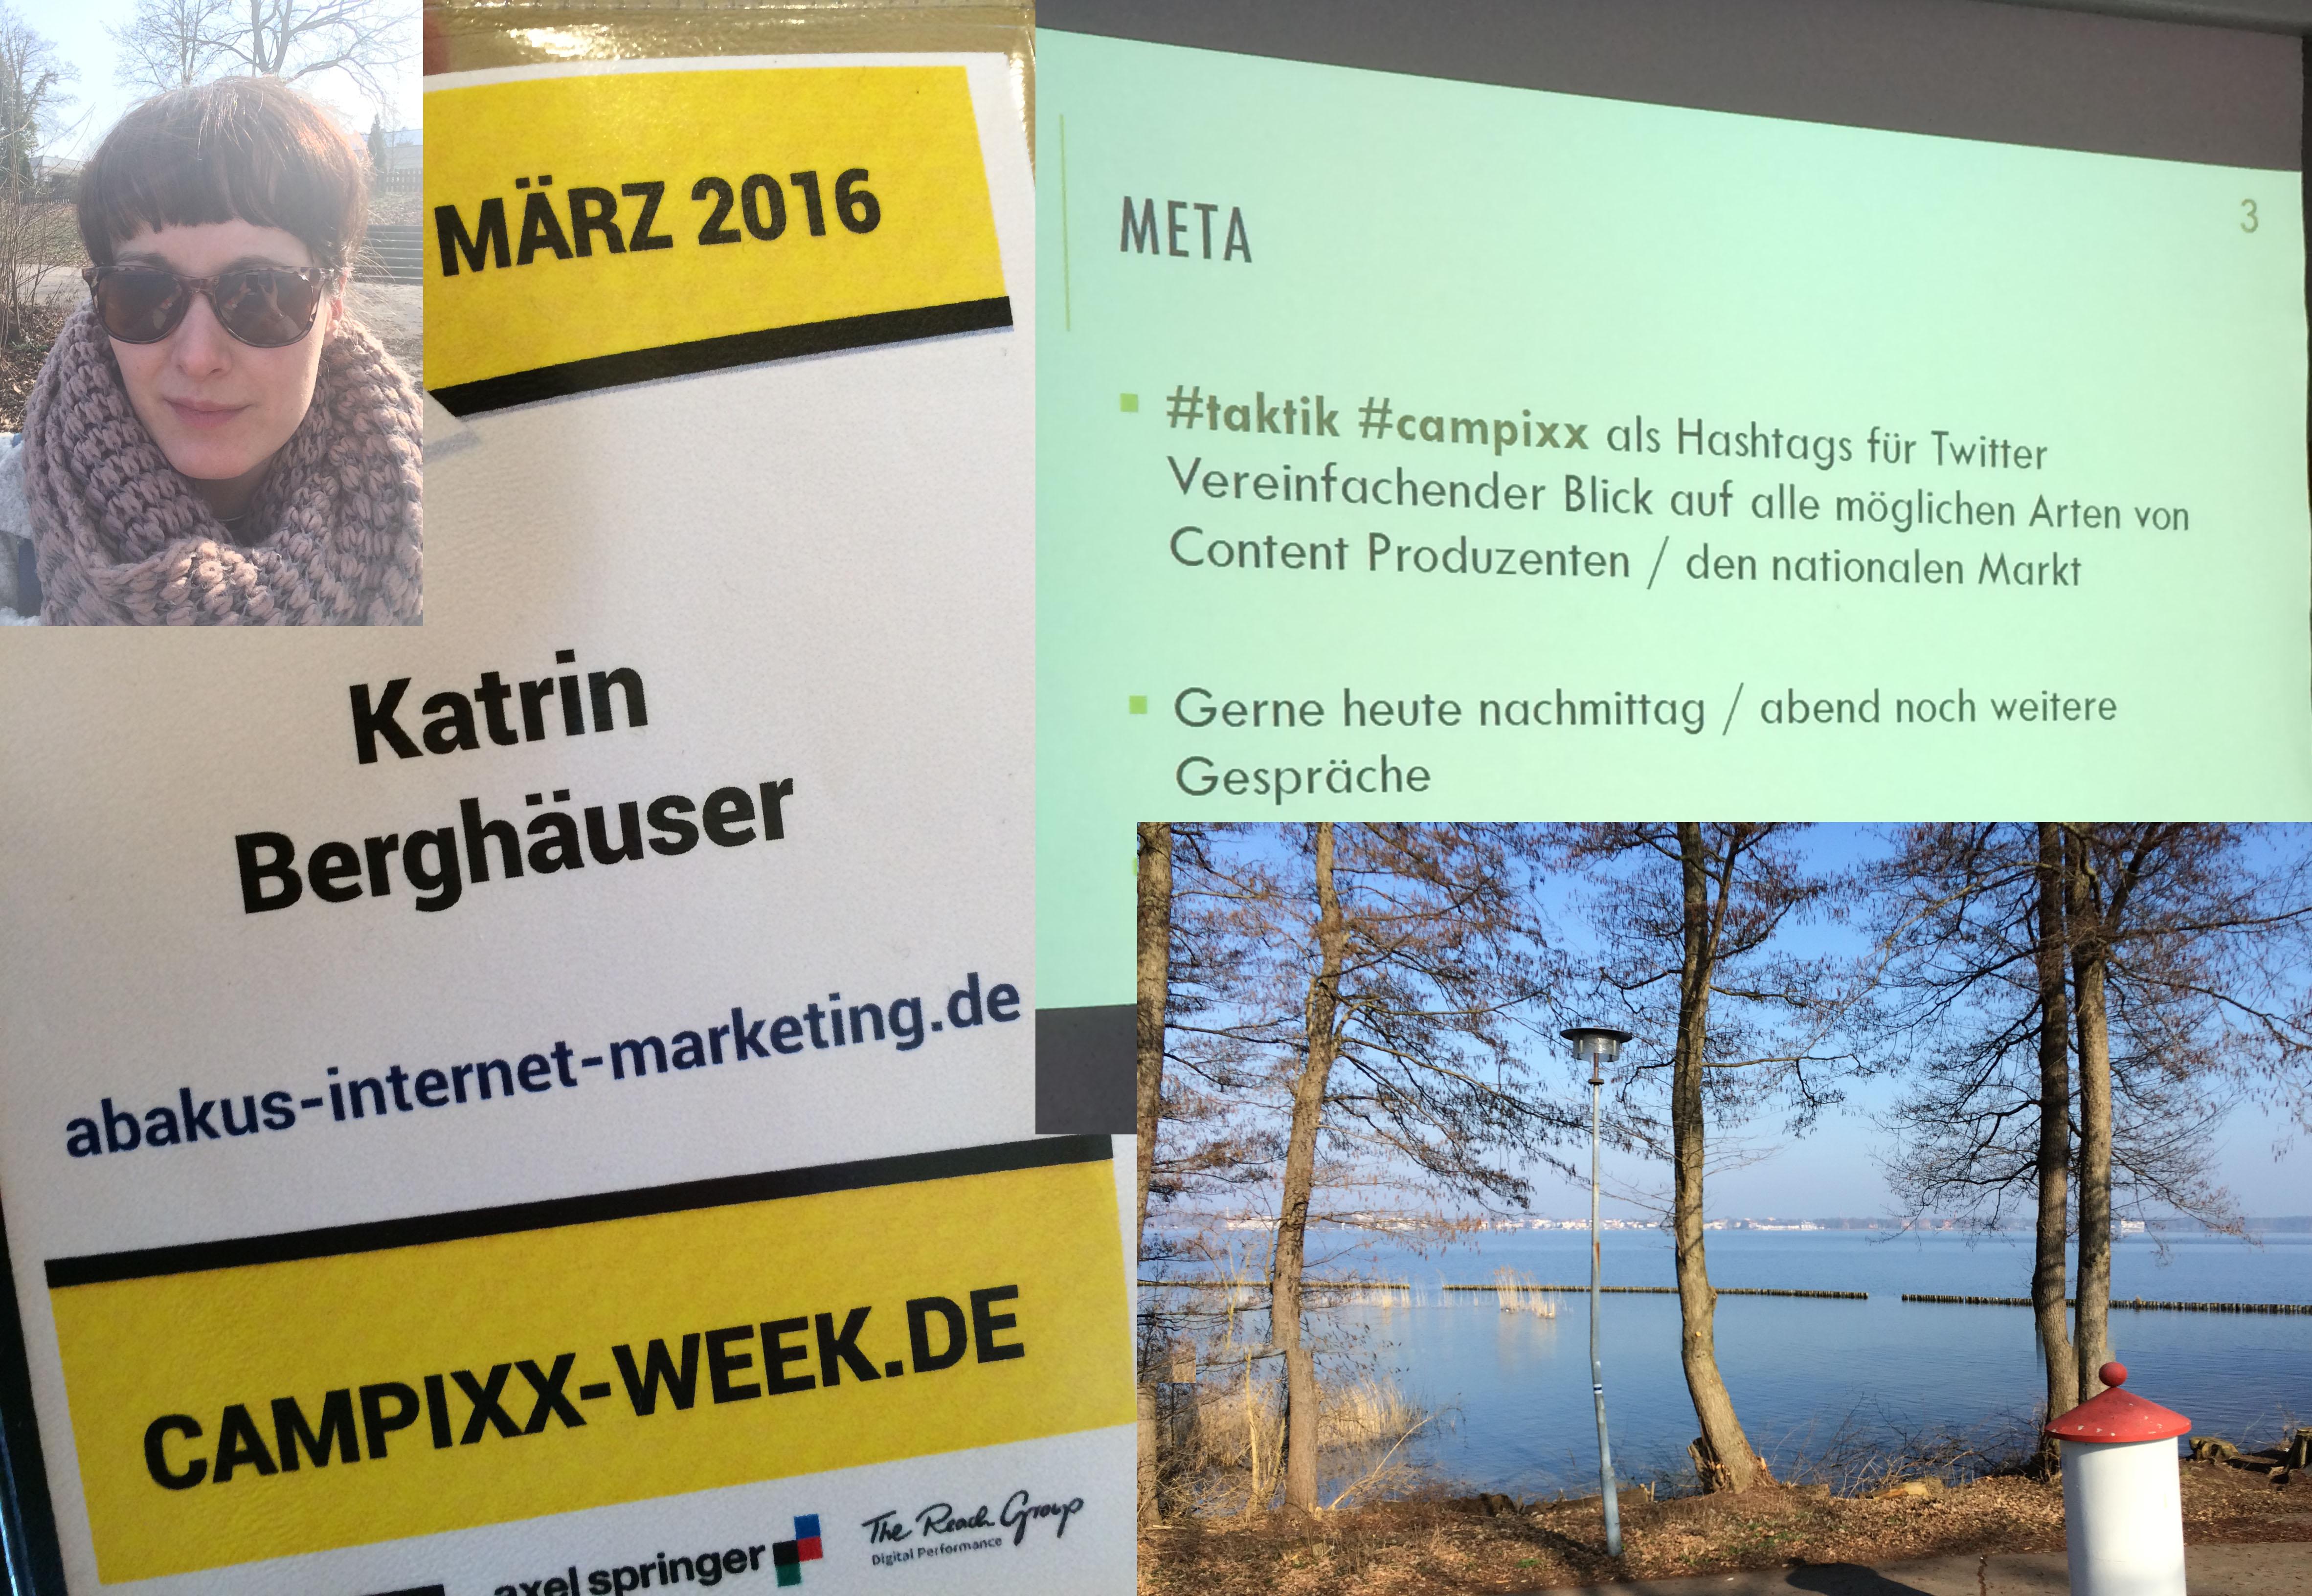 Campixx_Week_2016